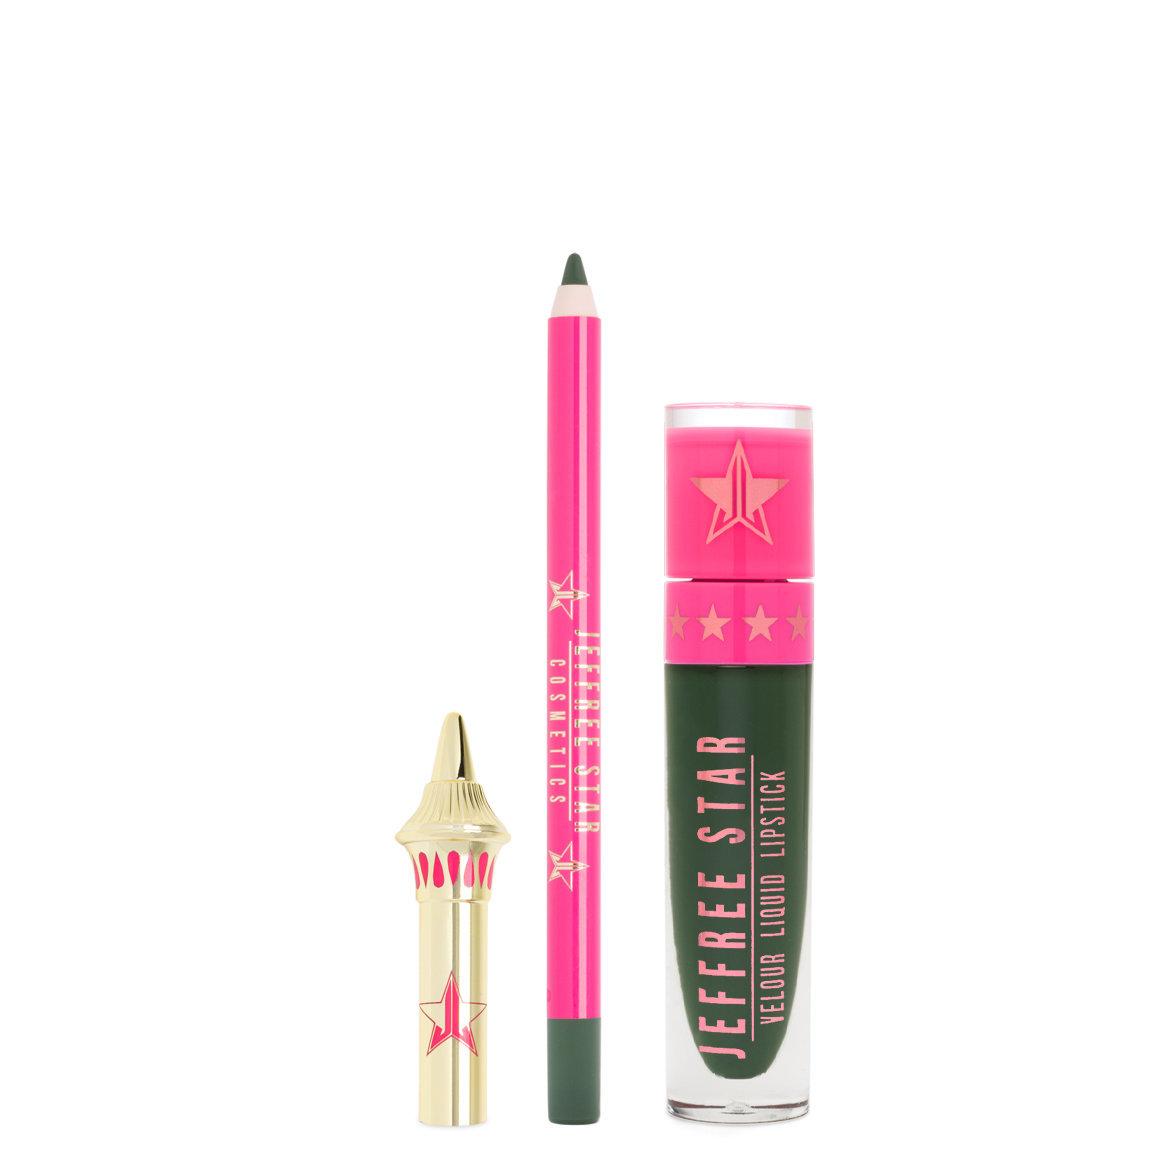 Jeffree Star Cosmetics Velour Lip Kit Crocodile Tears alternative view 1.